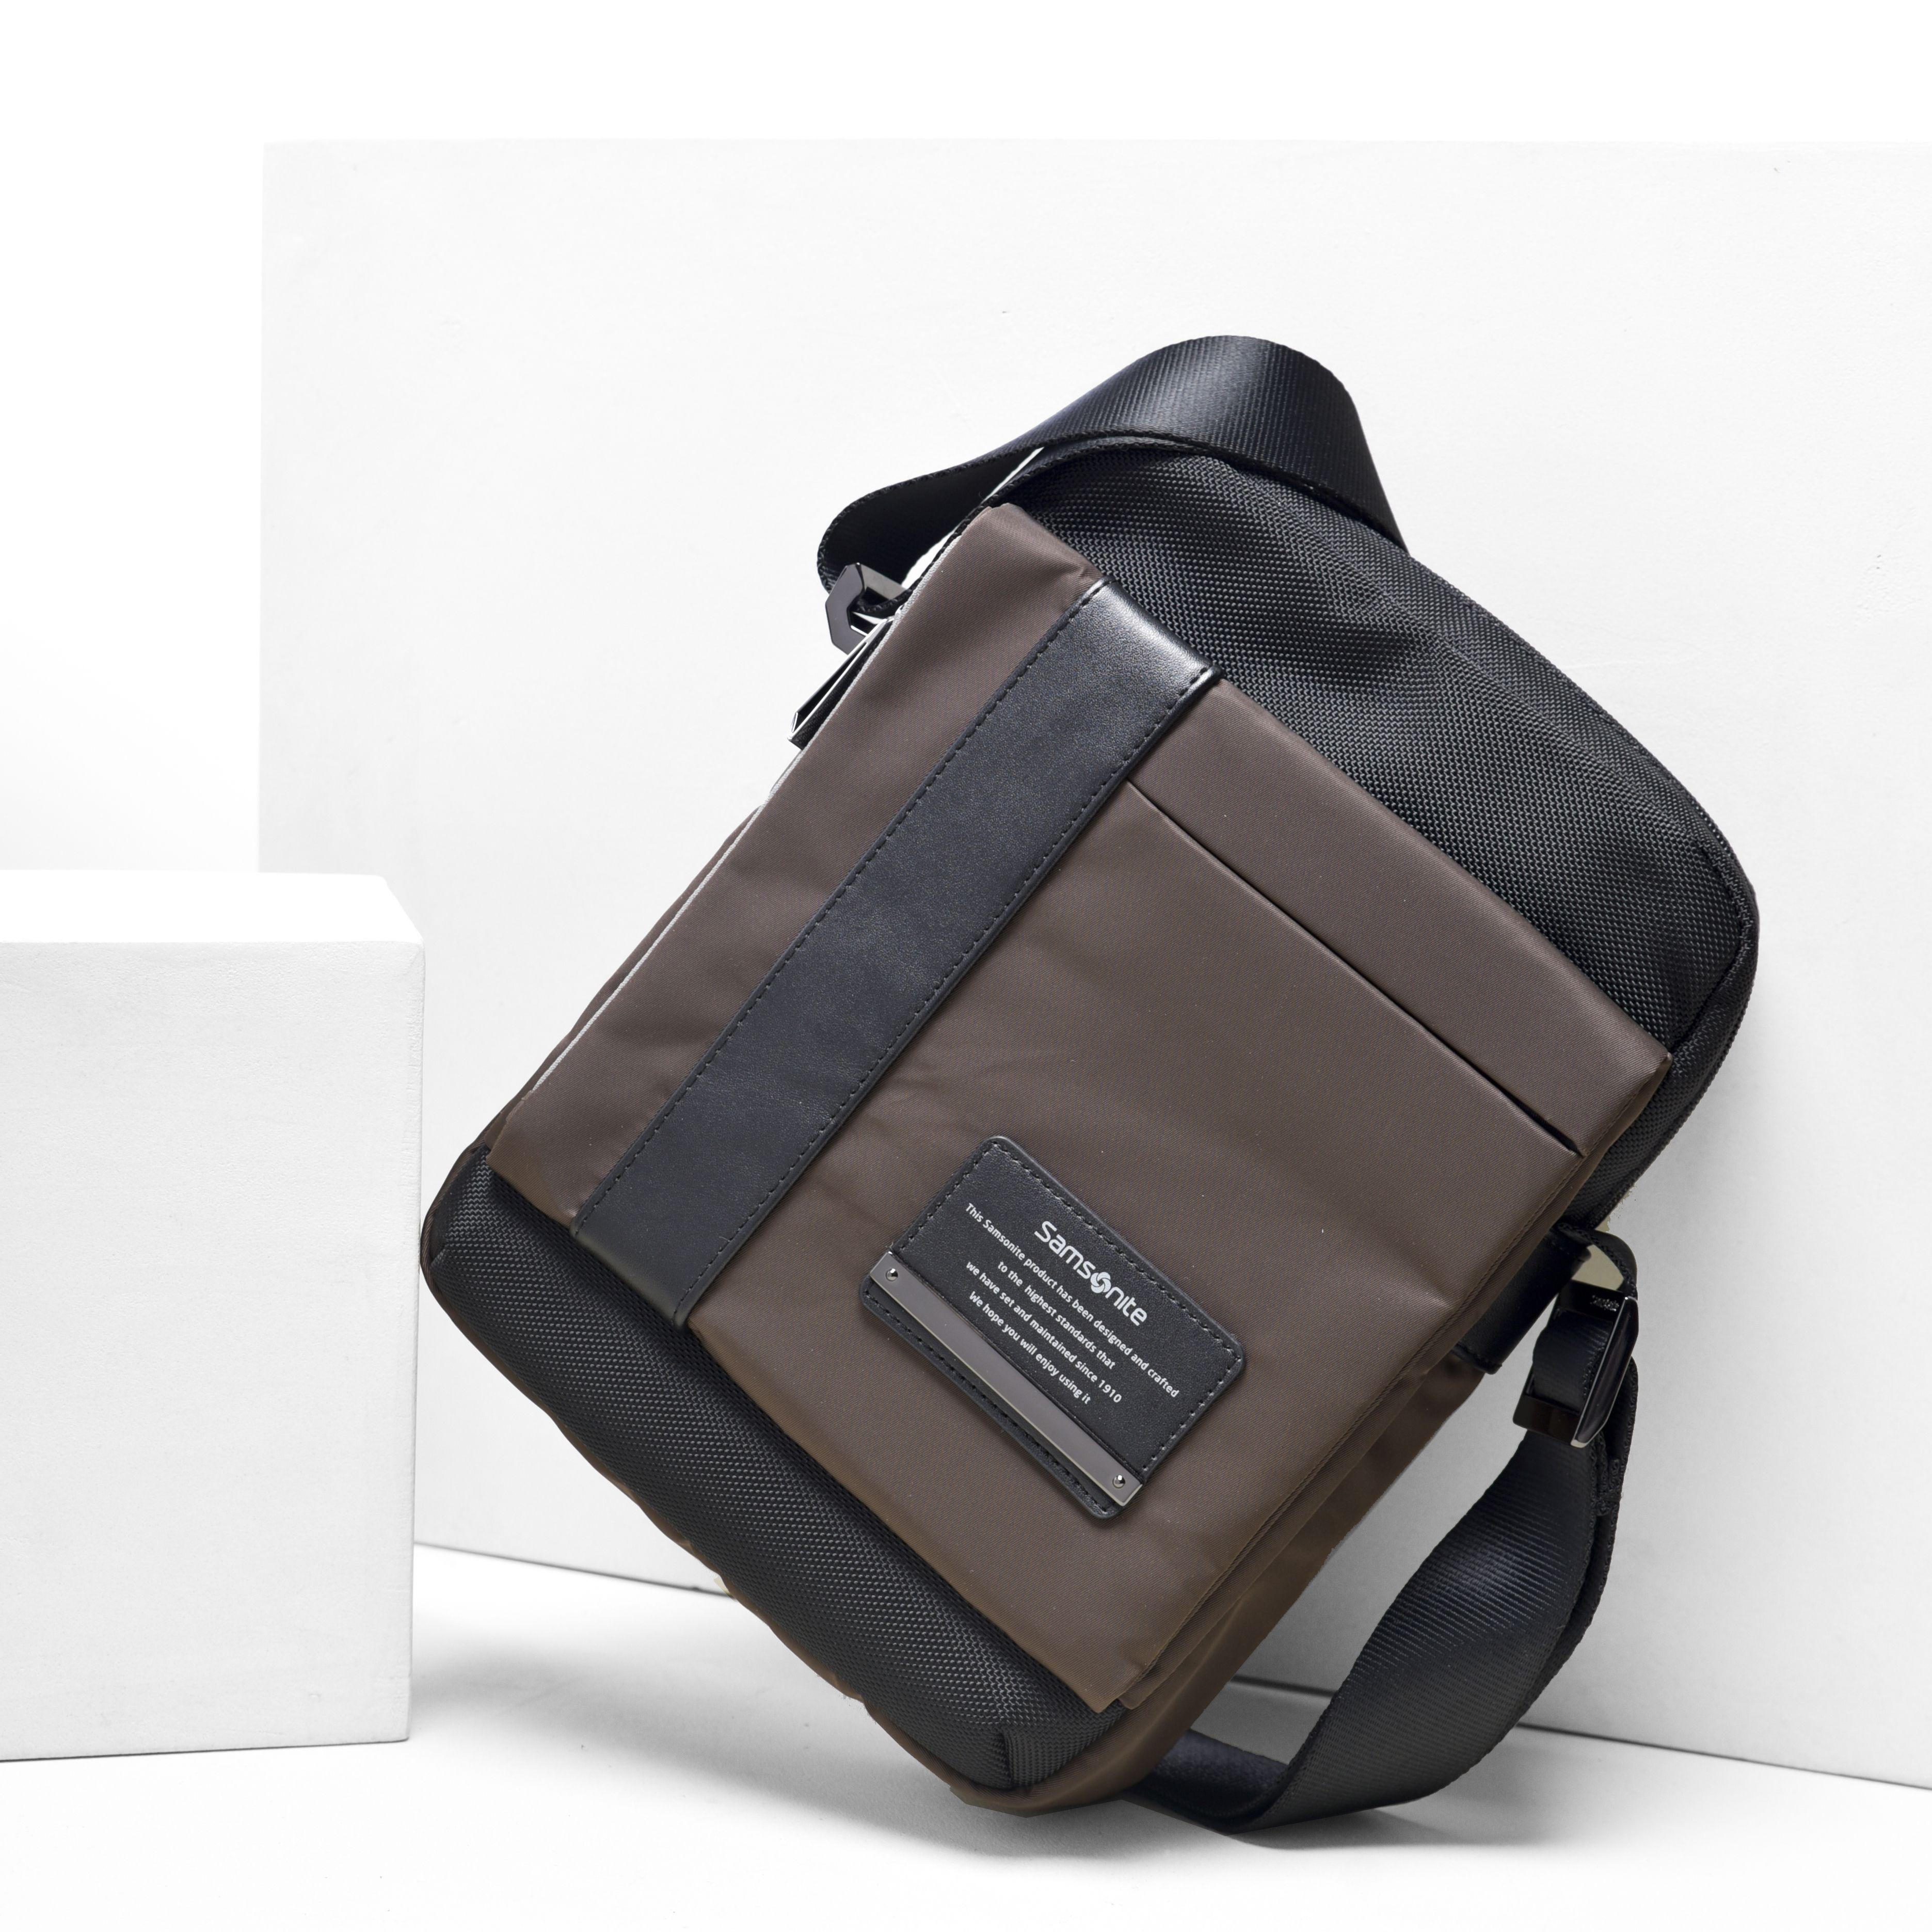 Samsonite Shoulderbag Brandbags Man Fashion Man S Class In